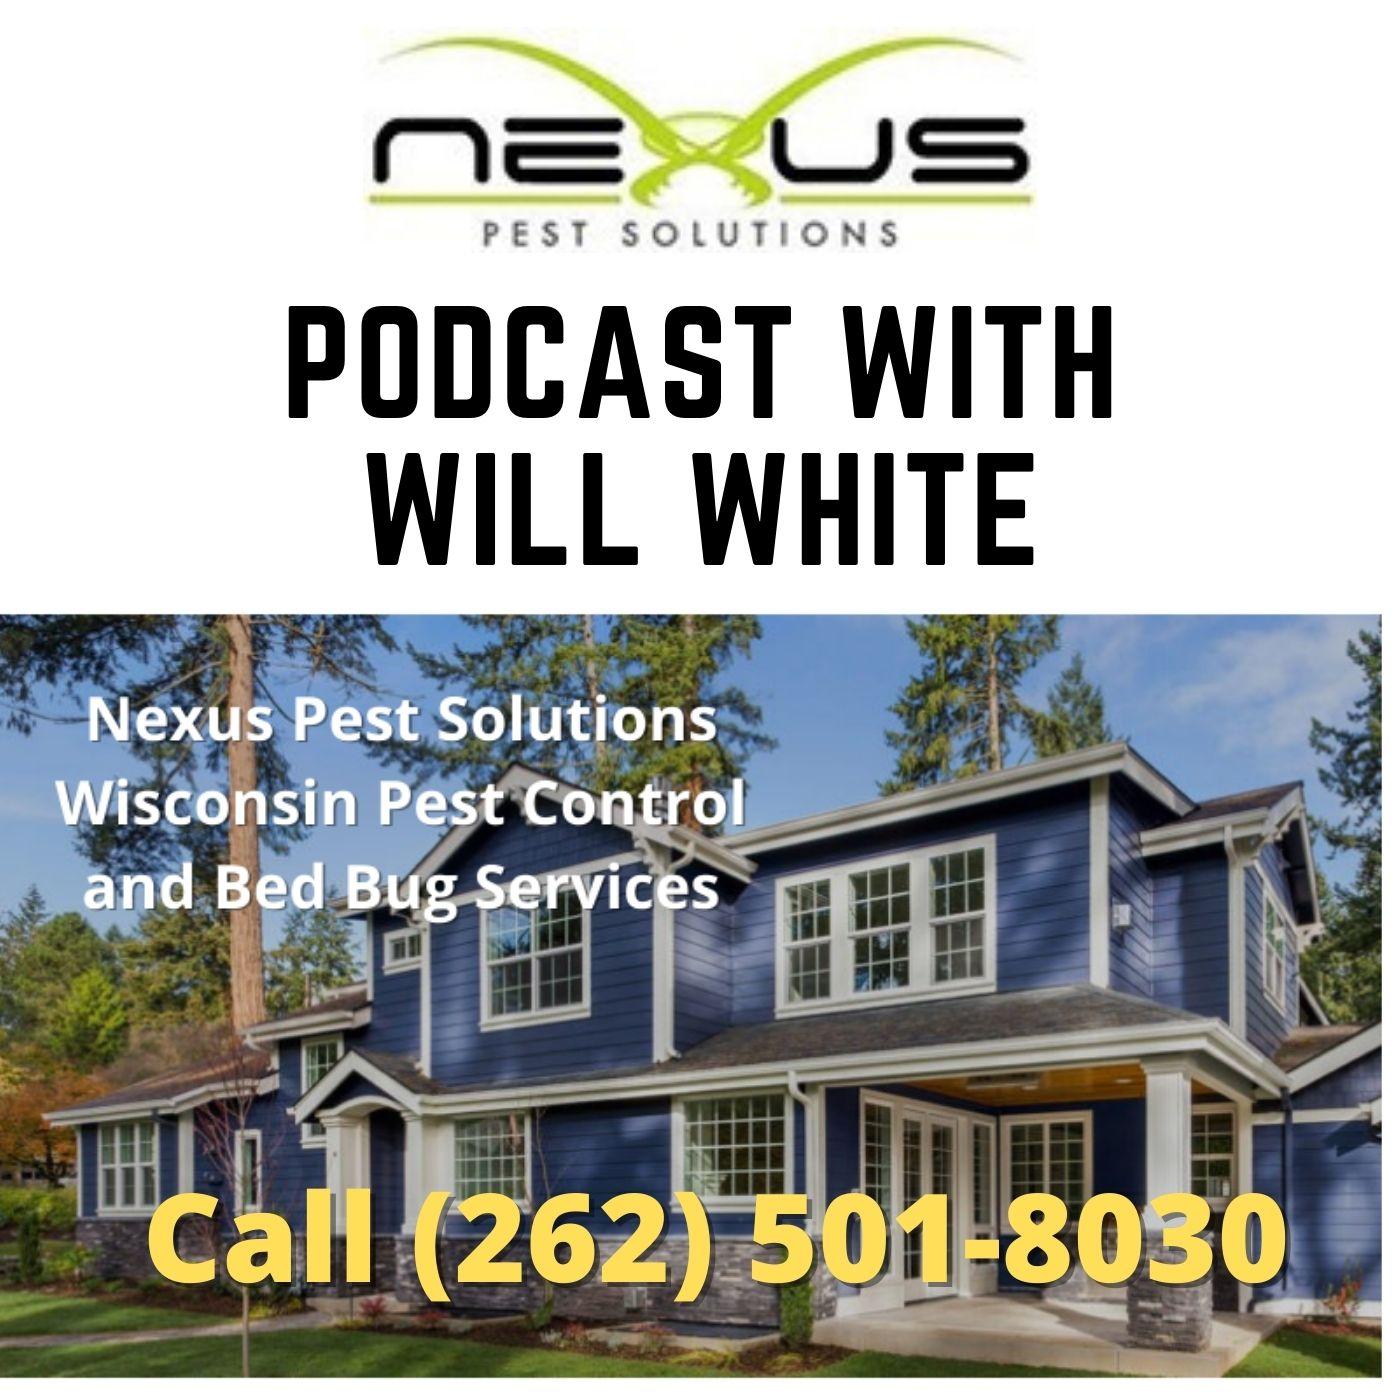 Nexus Pest